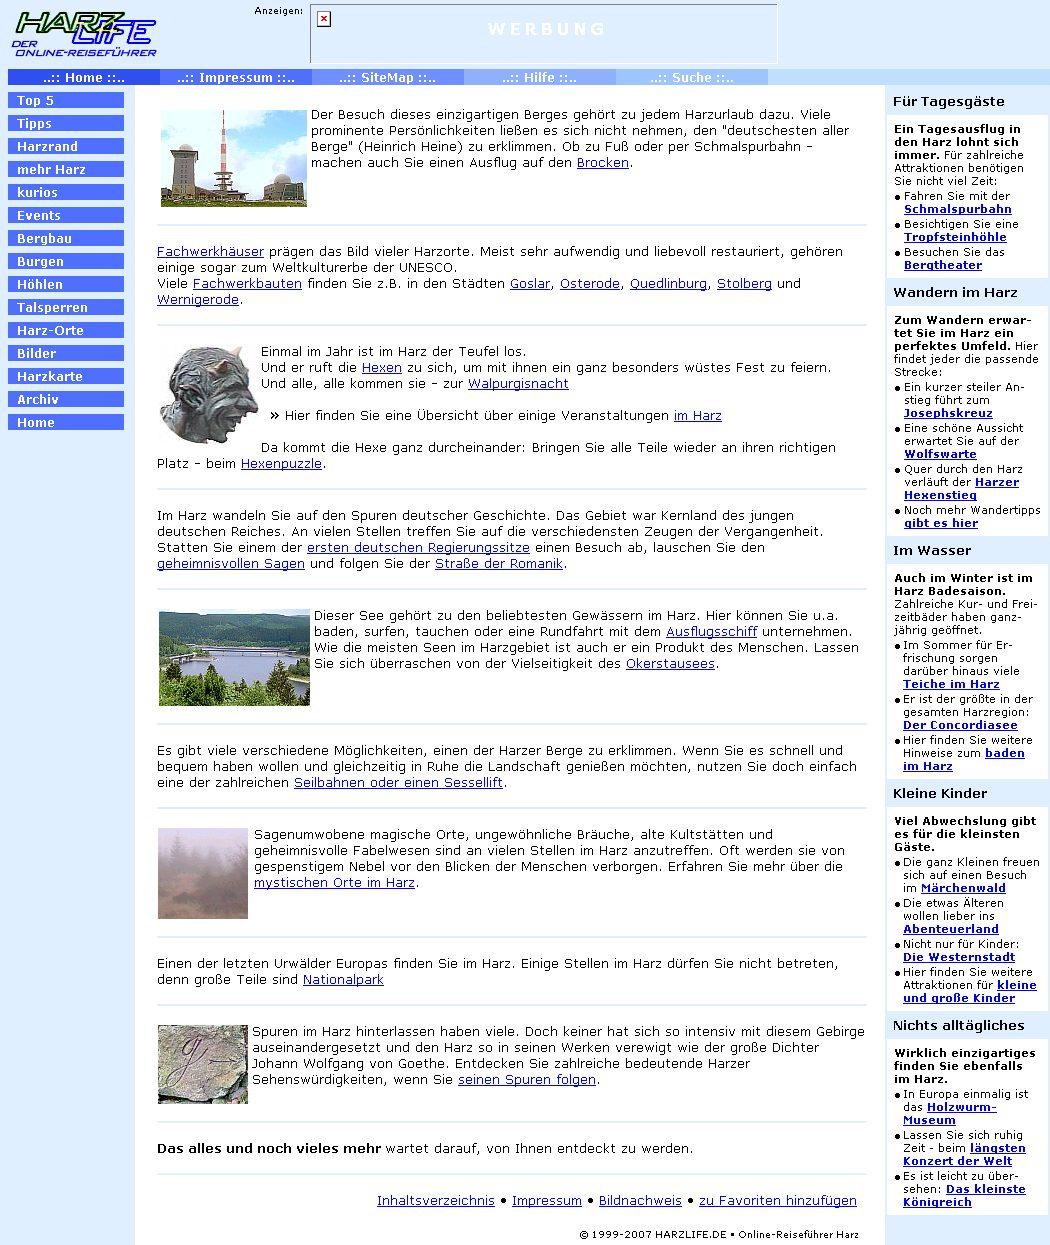 harzlife.de-Titelseite im November 2007